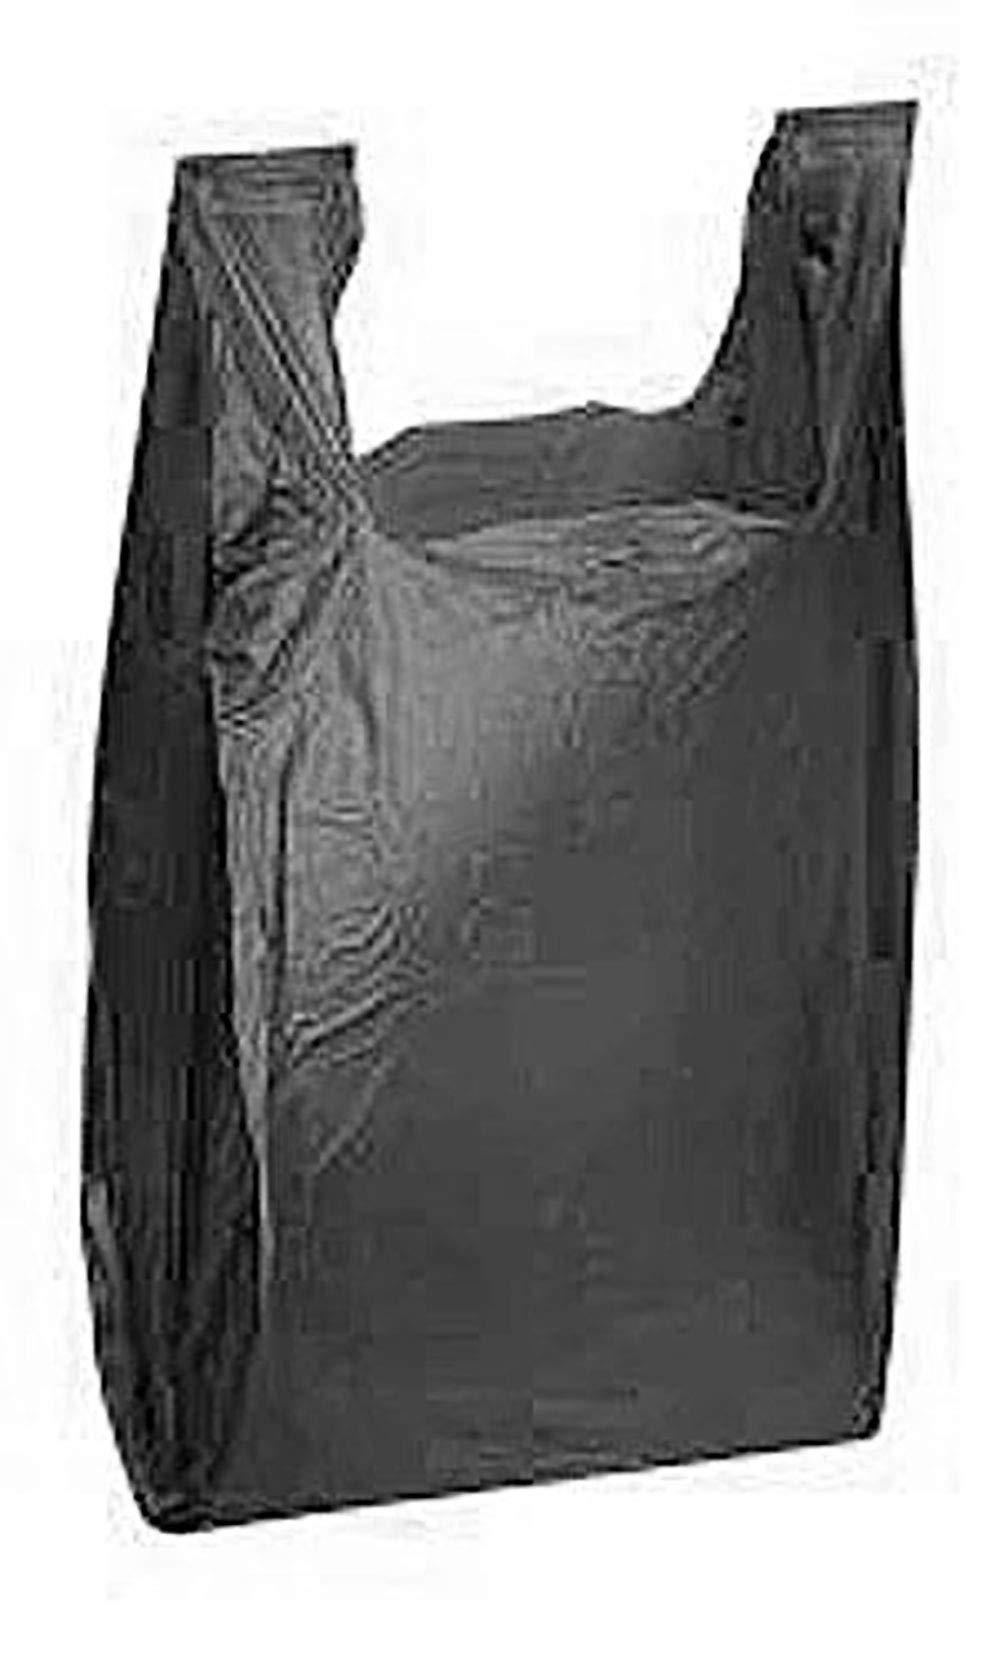 Black Plastic T-Shirt Shopping Bags (11 ½'' x 6'' x 21'') - Case of 1,000